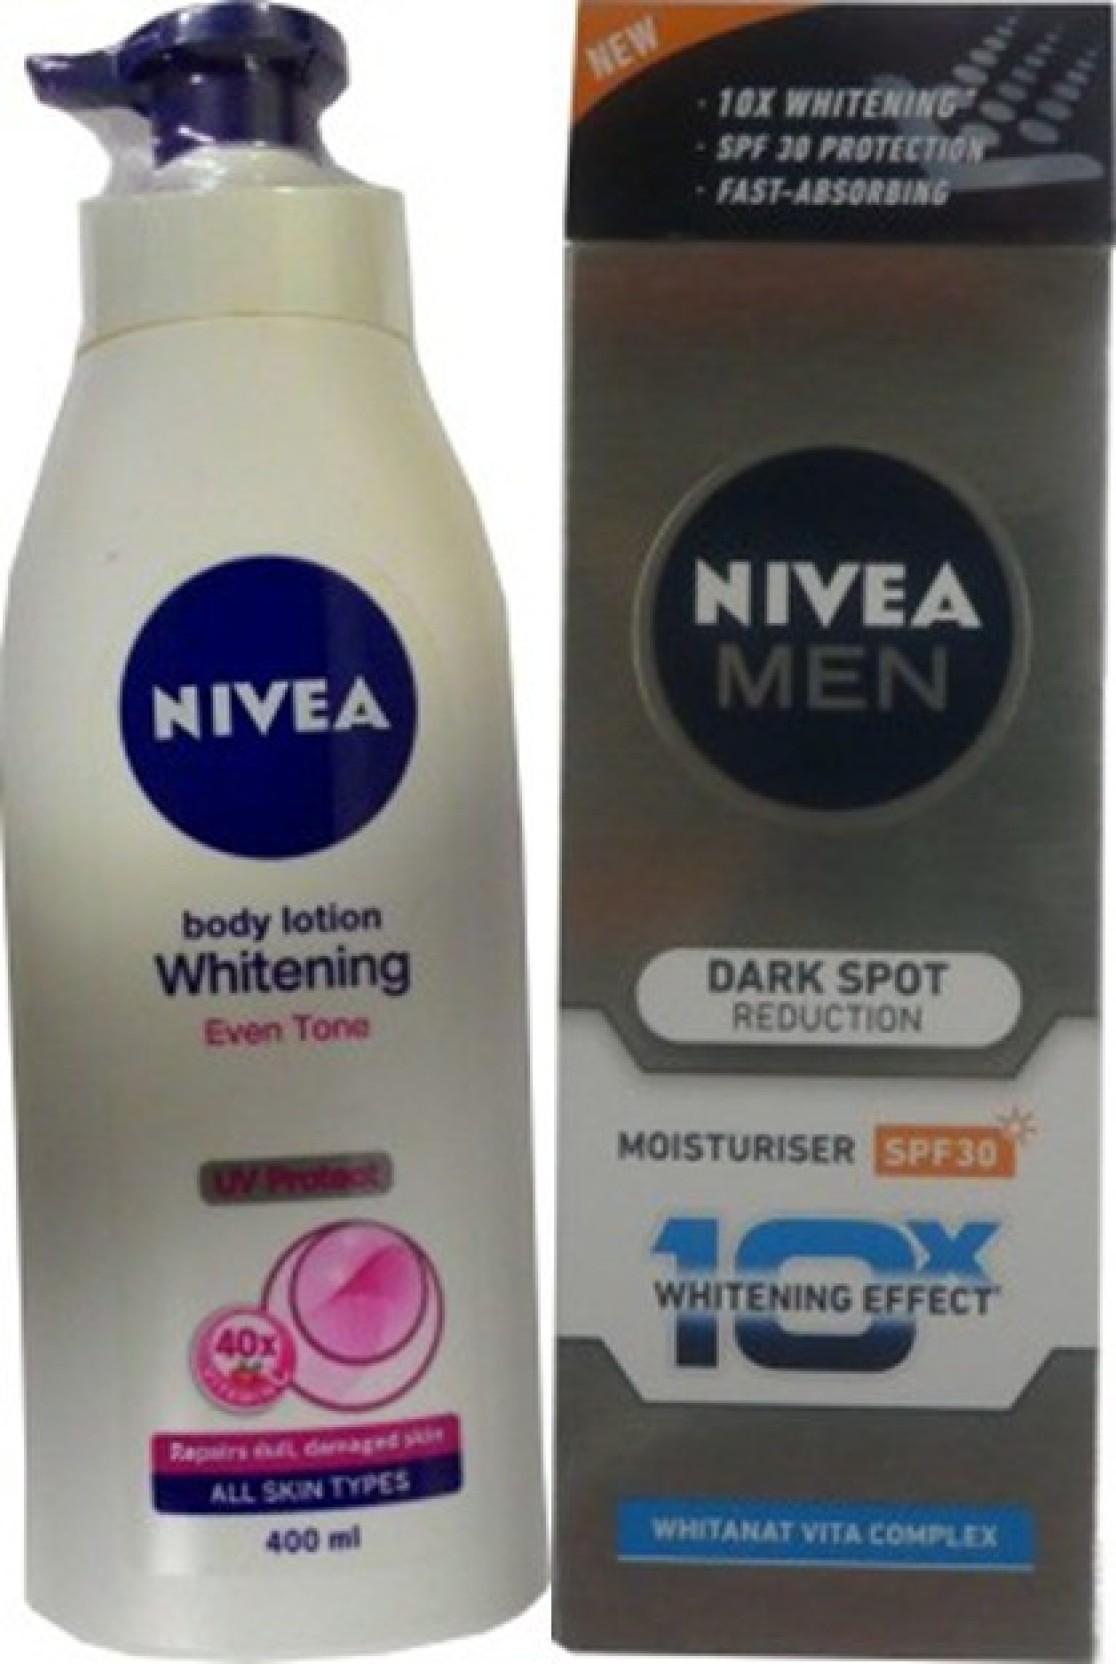 Nivea Whitening Cell Repair Uv Protect Body Lotion Dark Spot Extra White Firm Smooth 200ml Reduction Moisturiser Spf Share